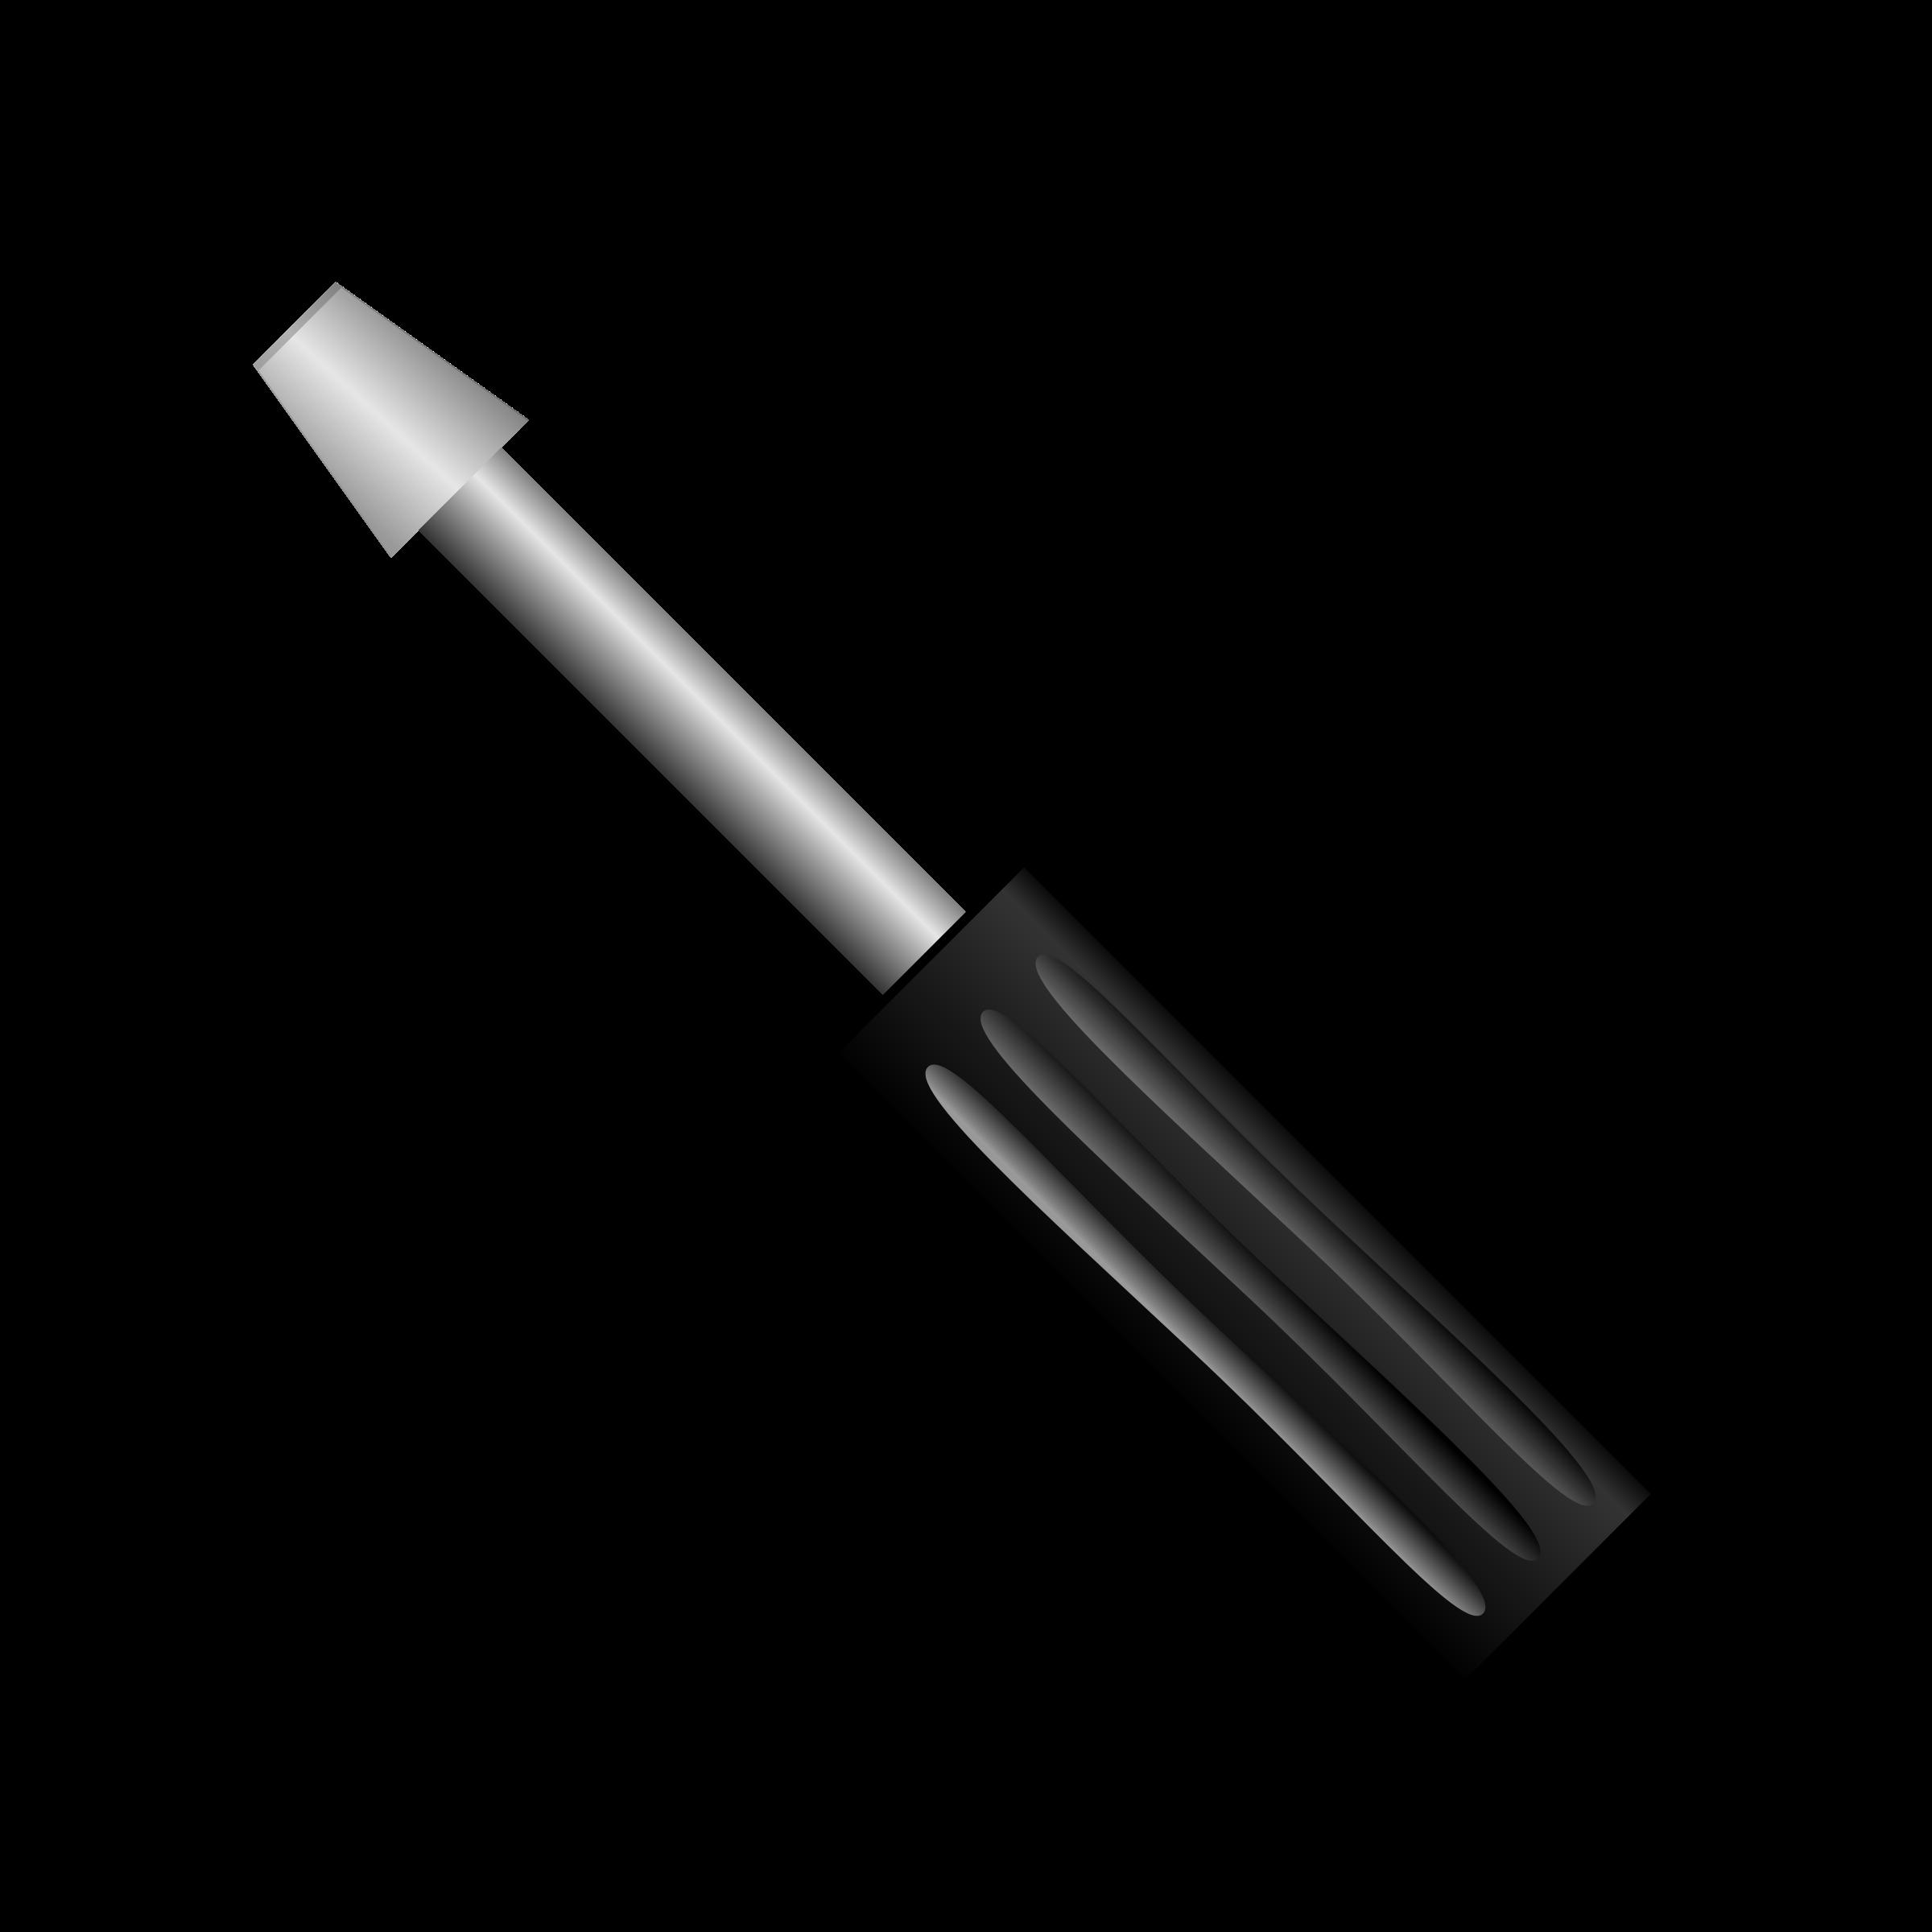 Screwdriver clipart screw gun. Png transparent images all